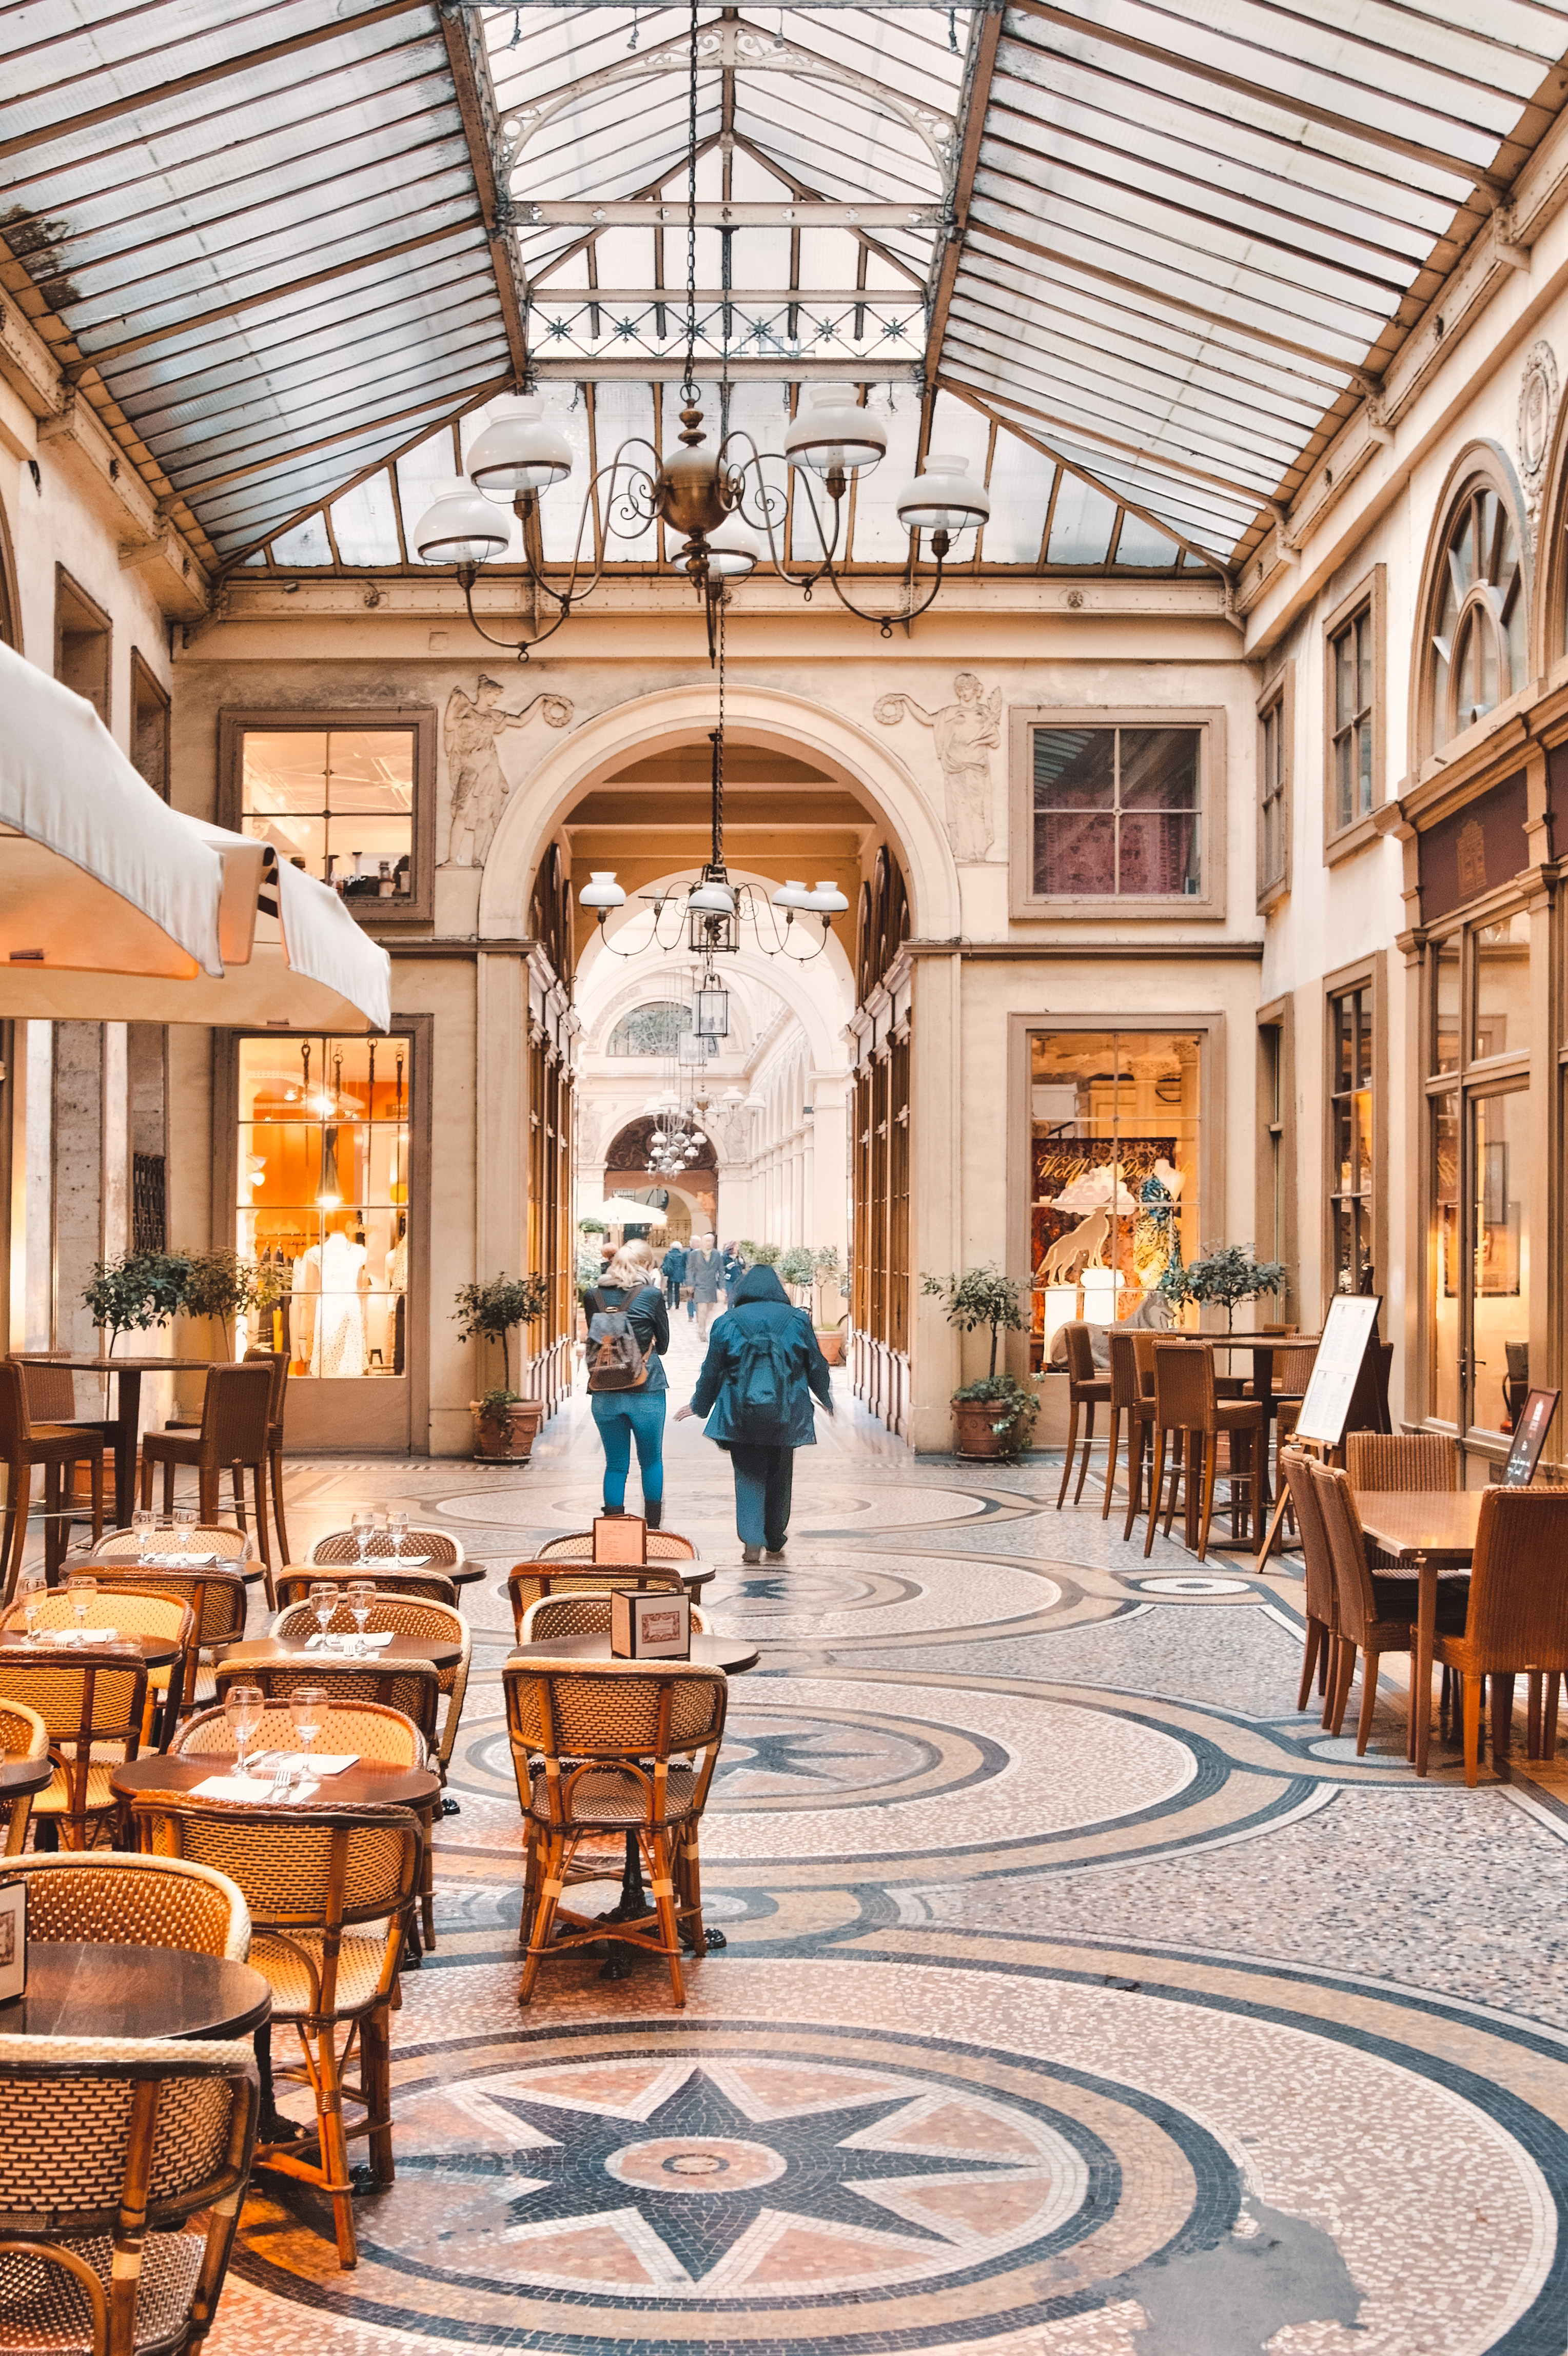 Paris pittoresque - Passage Vivienne